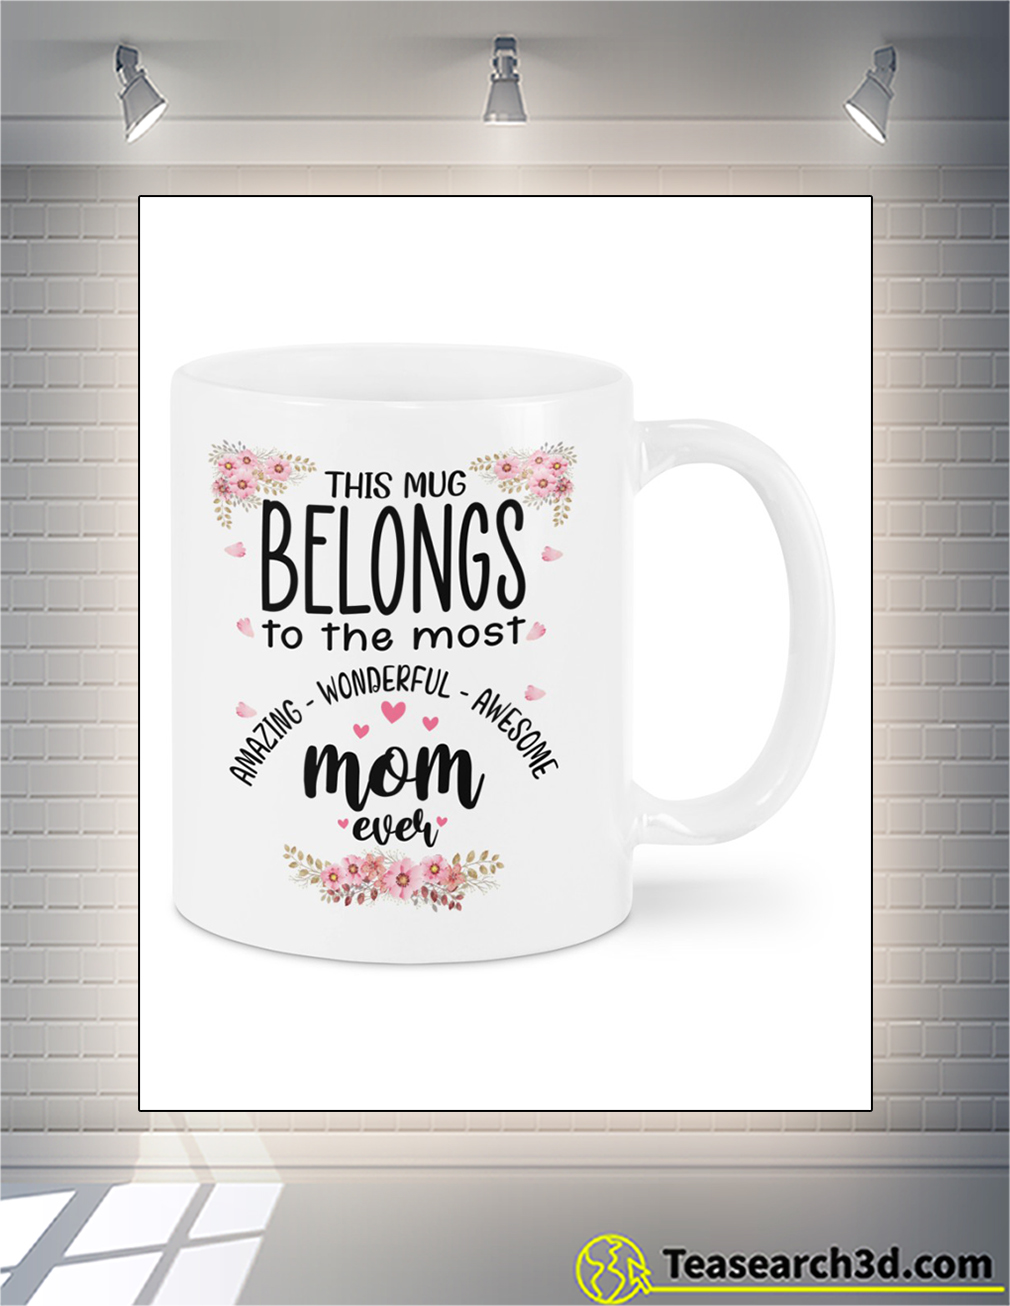 This mug belongs to the most amazing wonderful awesome mom ever mug